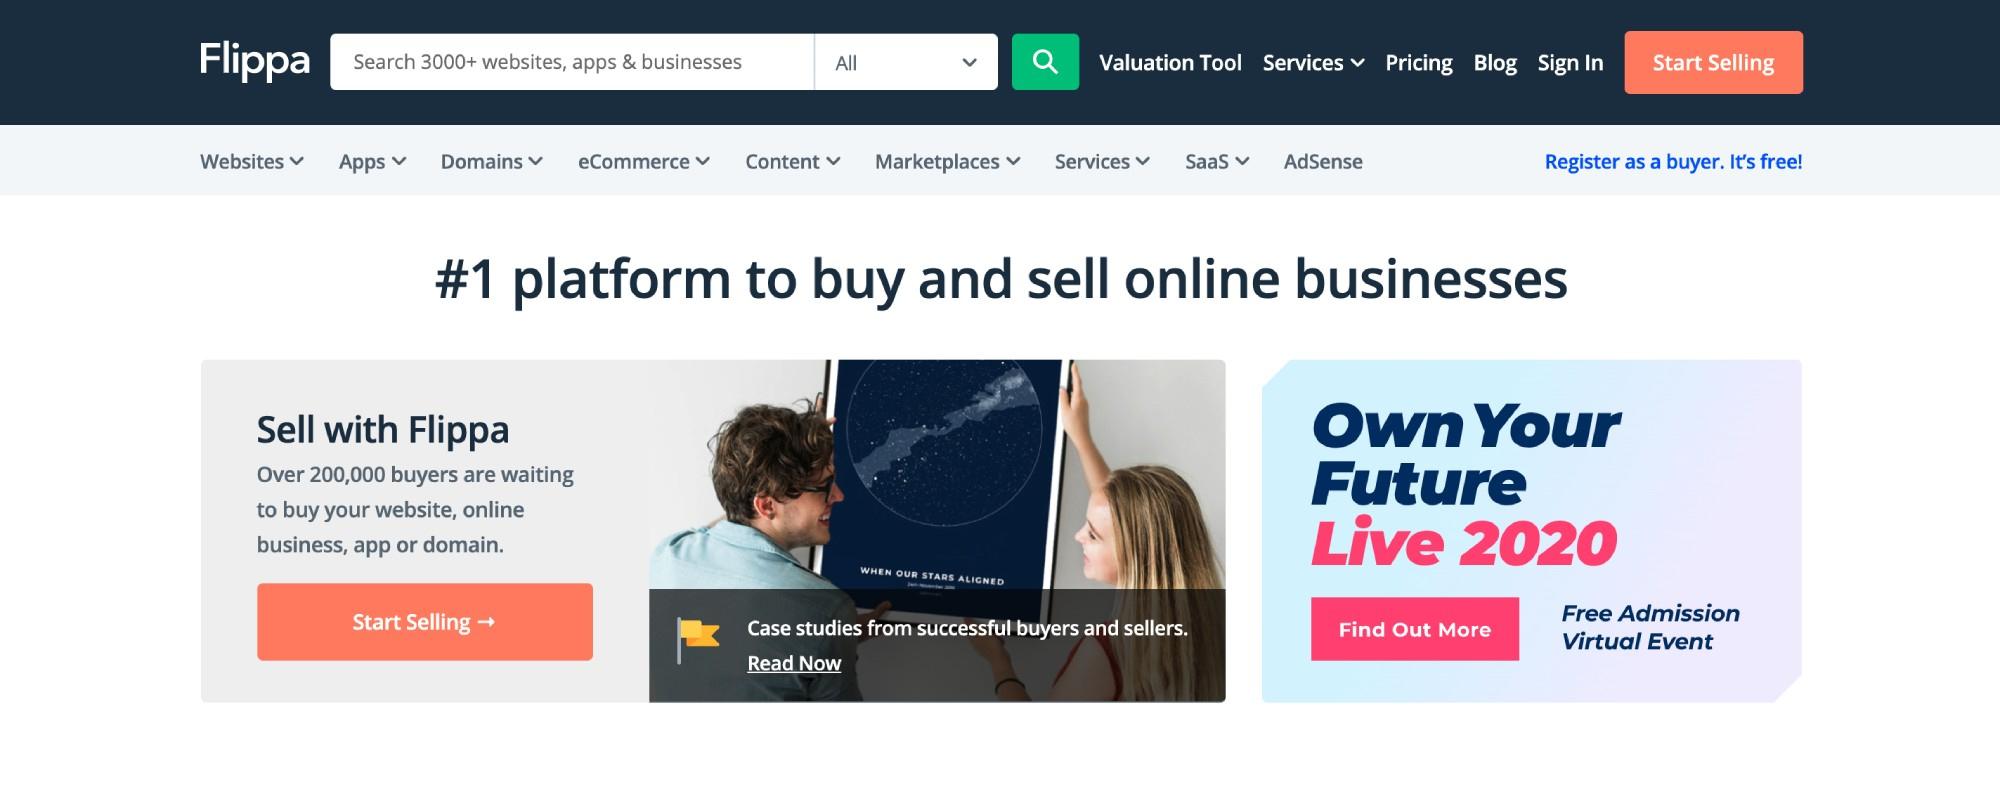 Flippa网站是购买高级域名的好地方